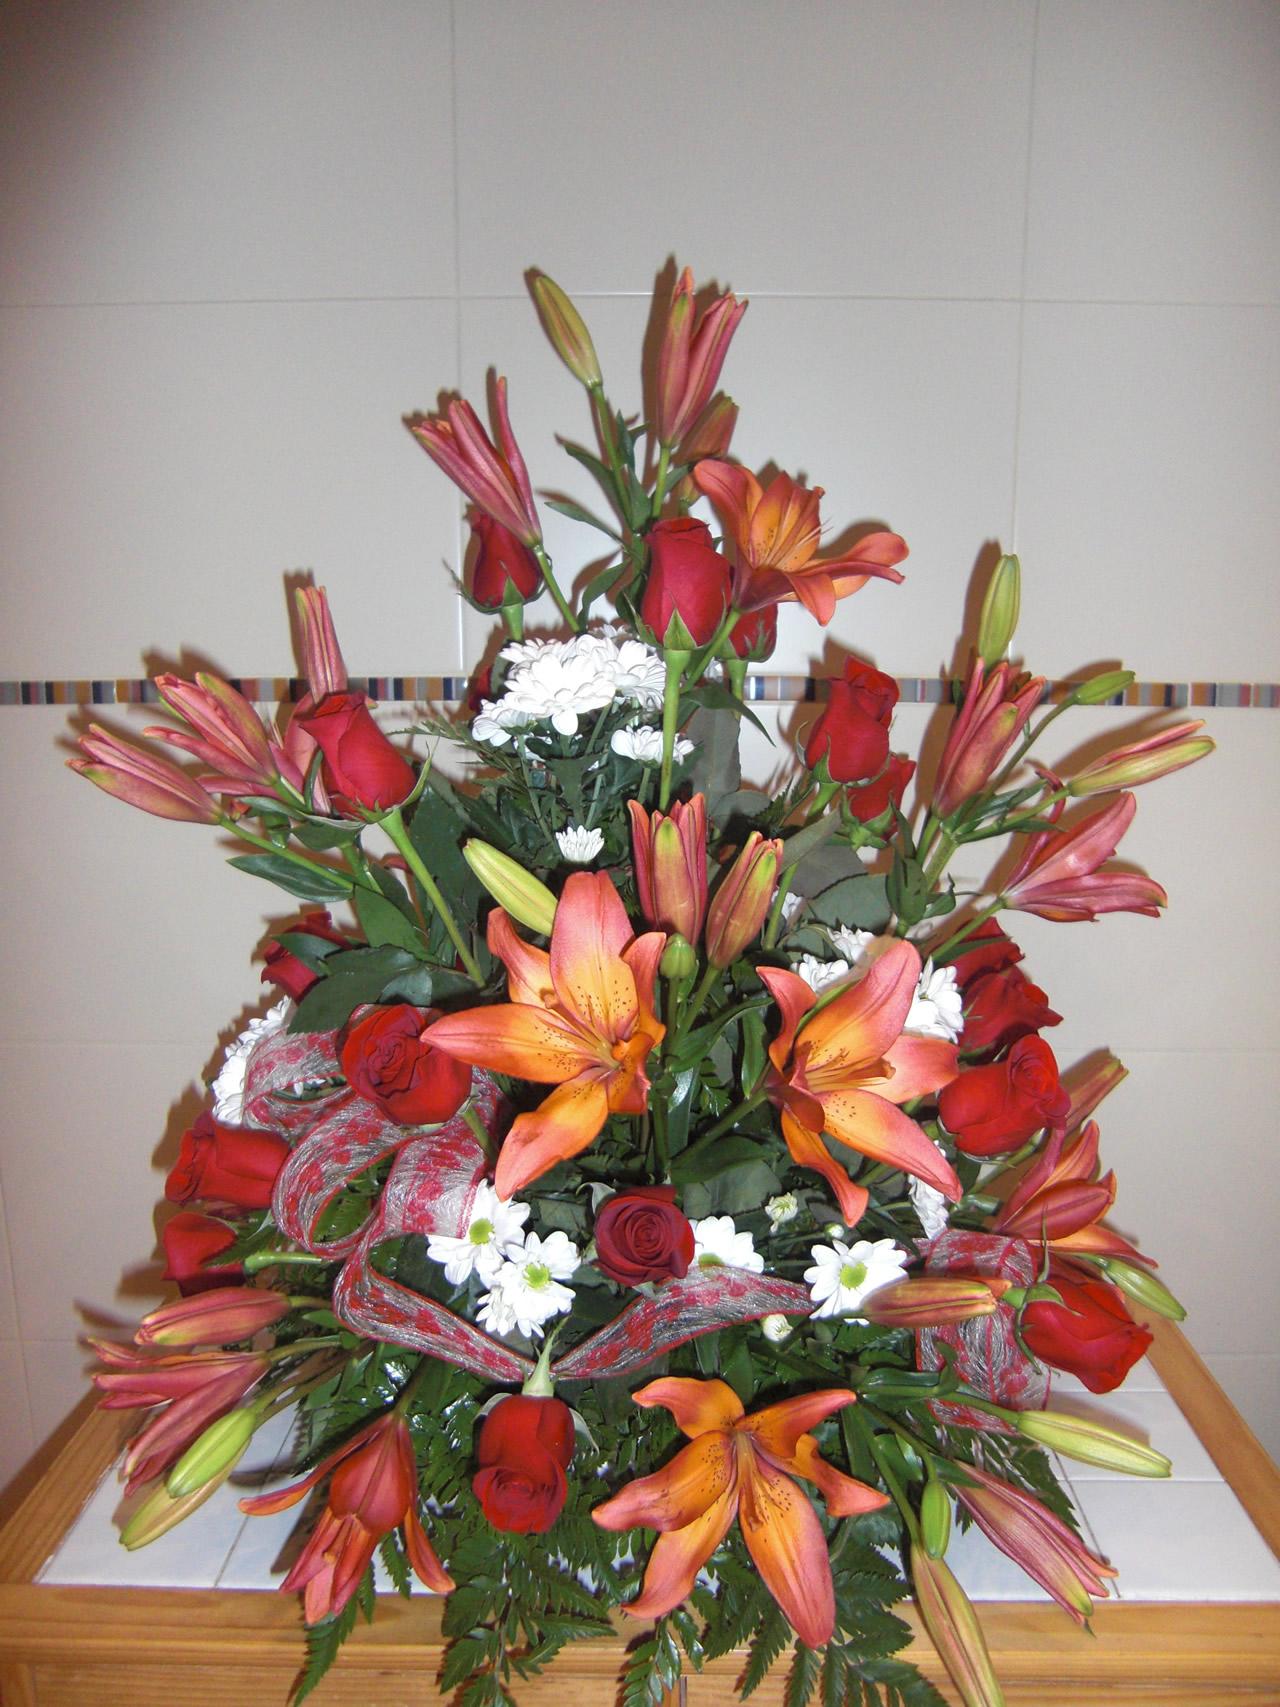 Centro de flores naturales 4 - Centros de plantas naturales ...